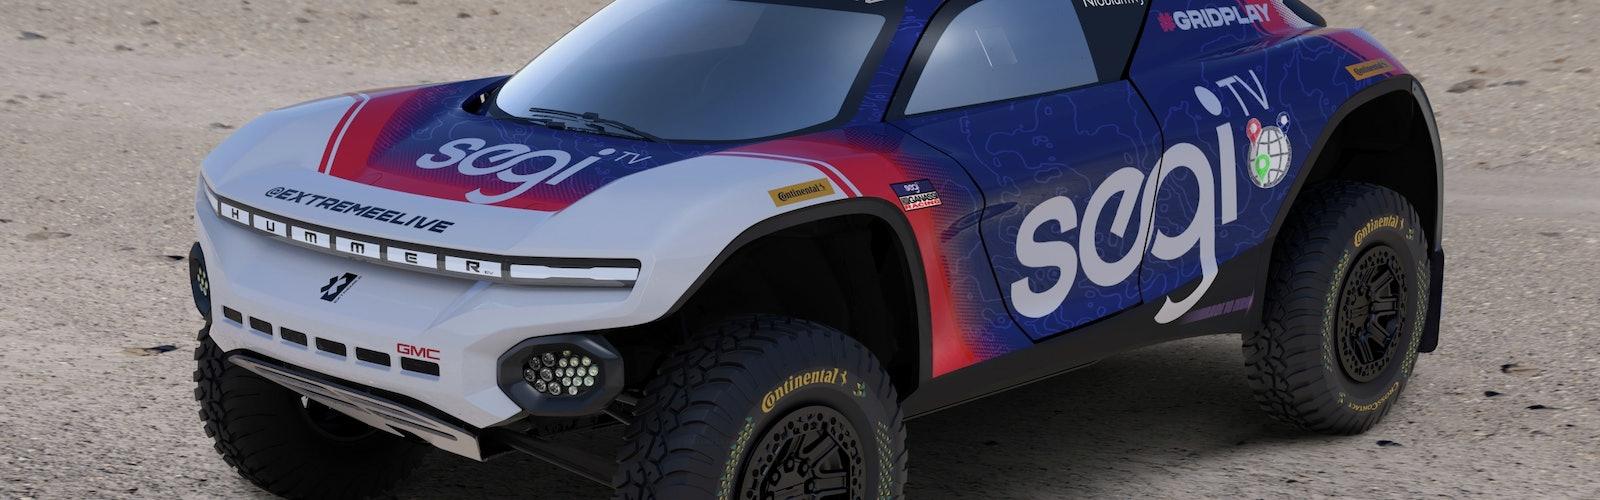 Segi-TV-Chip-Ganassi-Racing_4-2048×2048